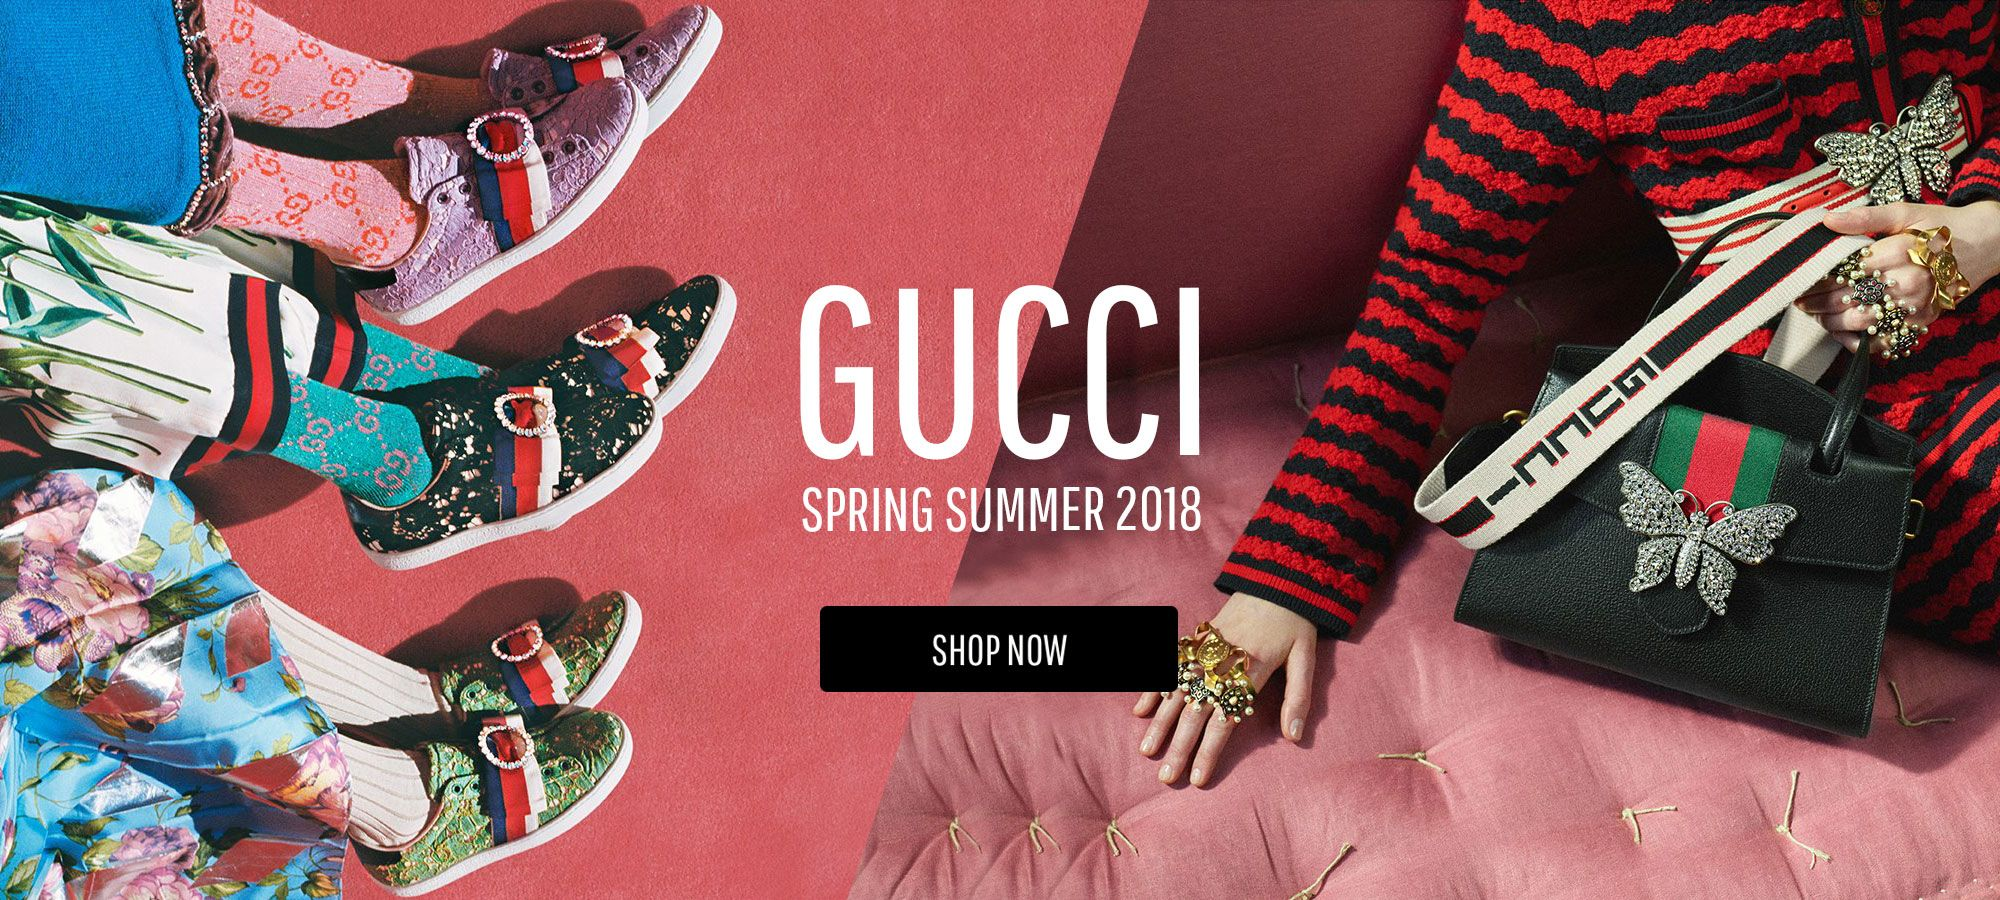 Gucci Women - Spring Summer 2018